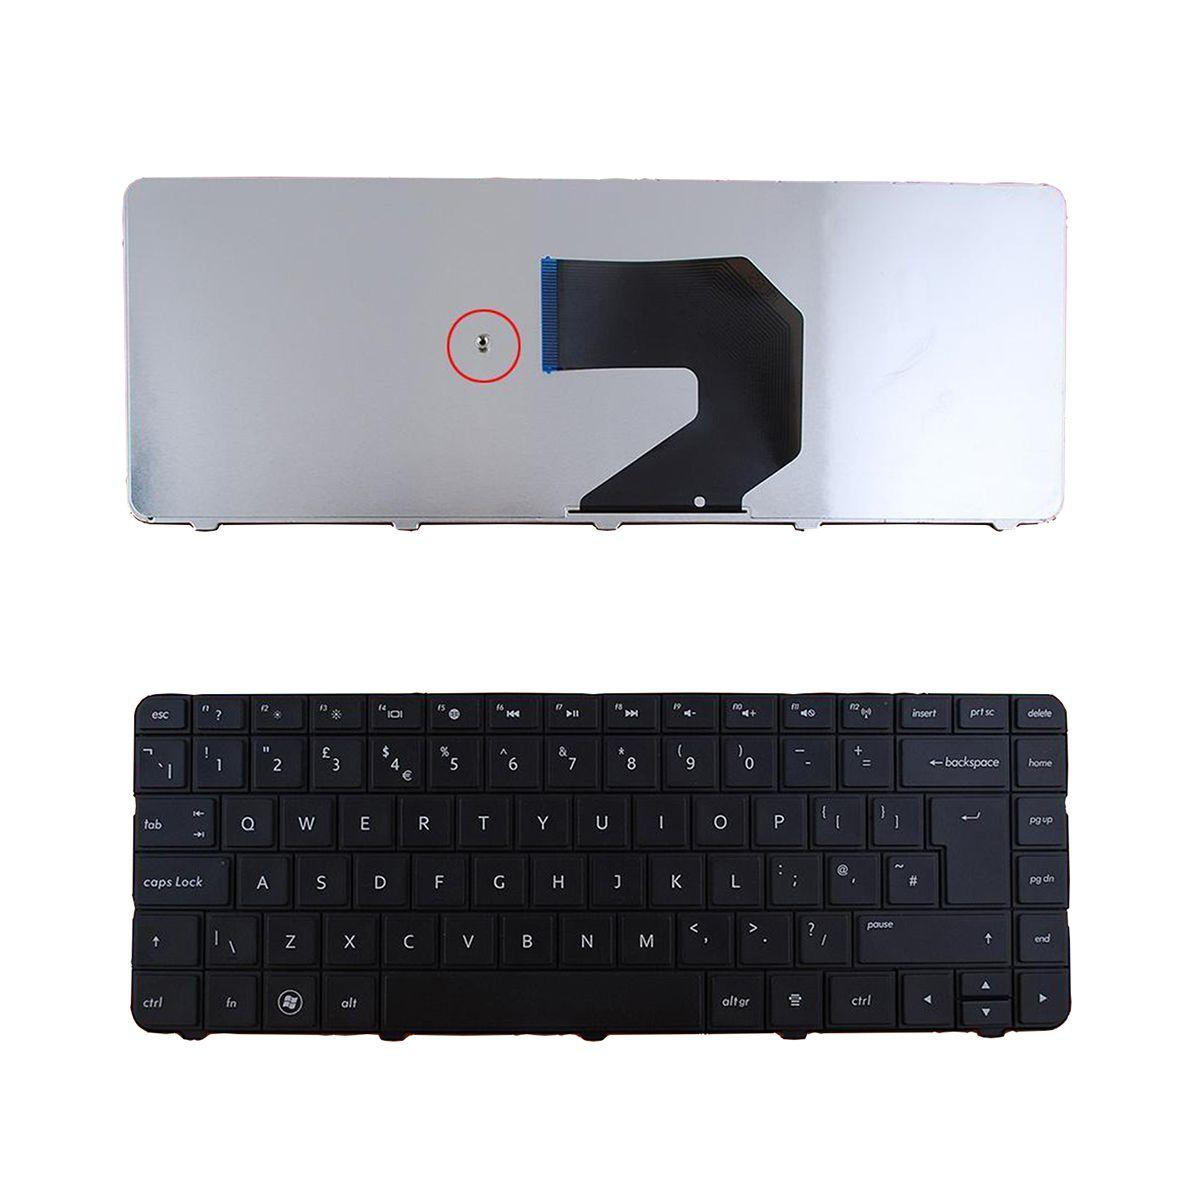 Teclado NOVO UK Para HP Pavilion G4-1000 G6-1000 CQ43 CQ57 430 630S PRETO (com papel alumínio, OEM) UK layout substituir Reparação teclado Keyboard